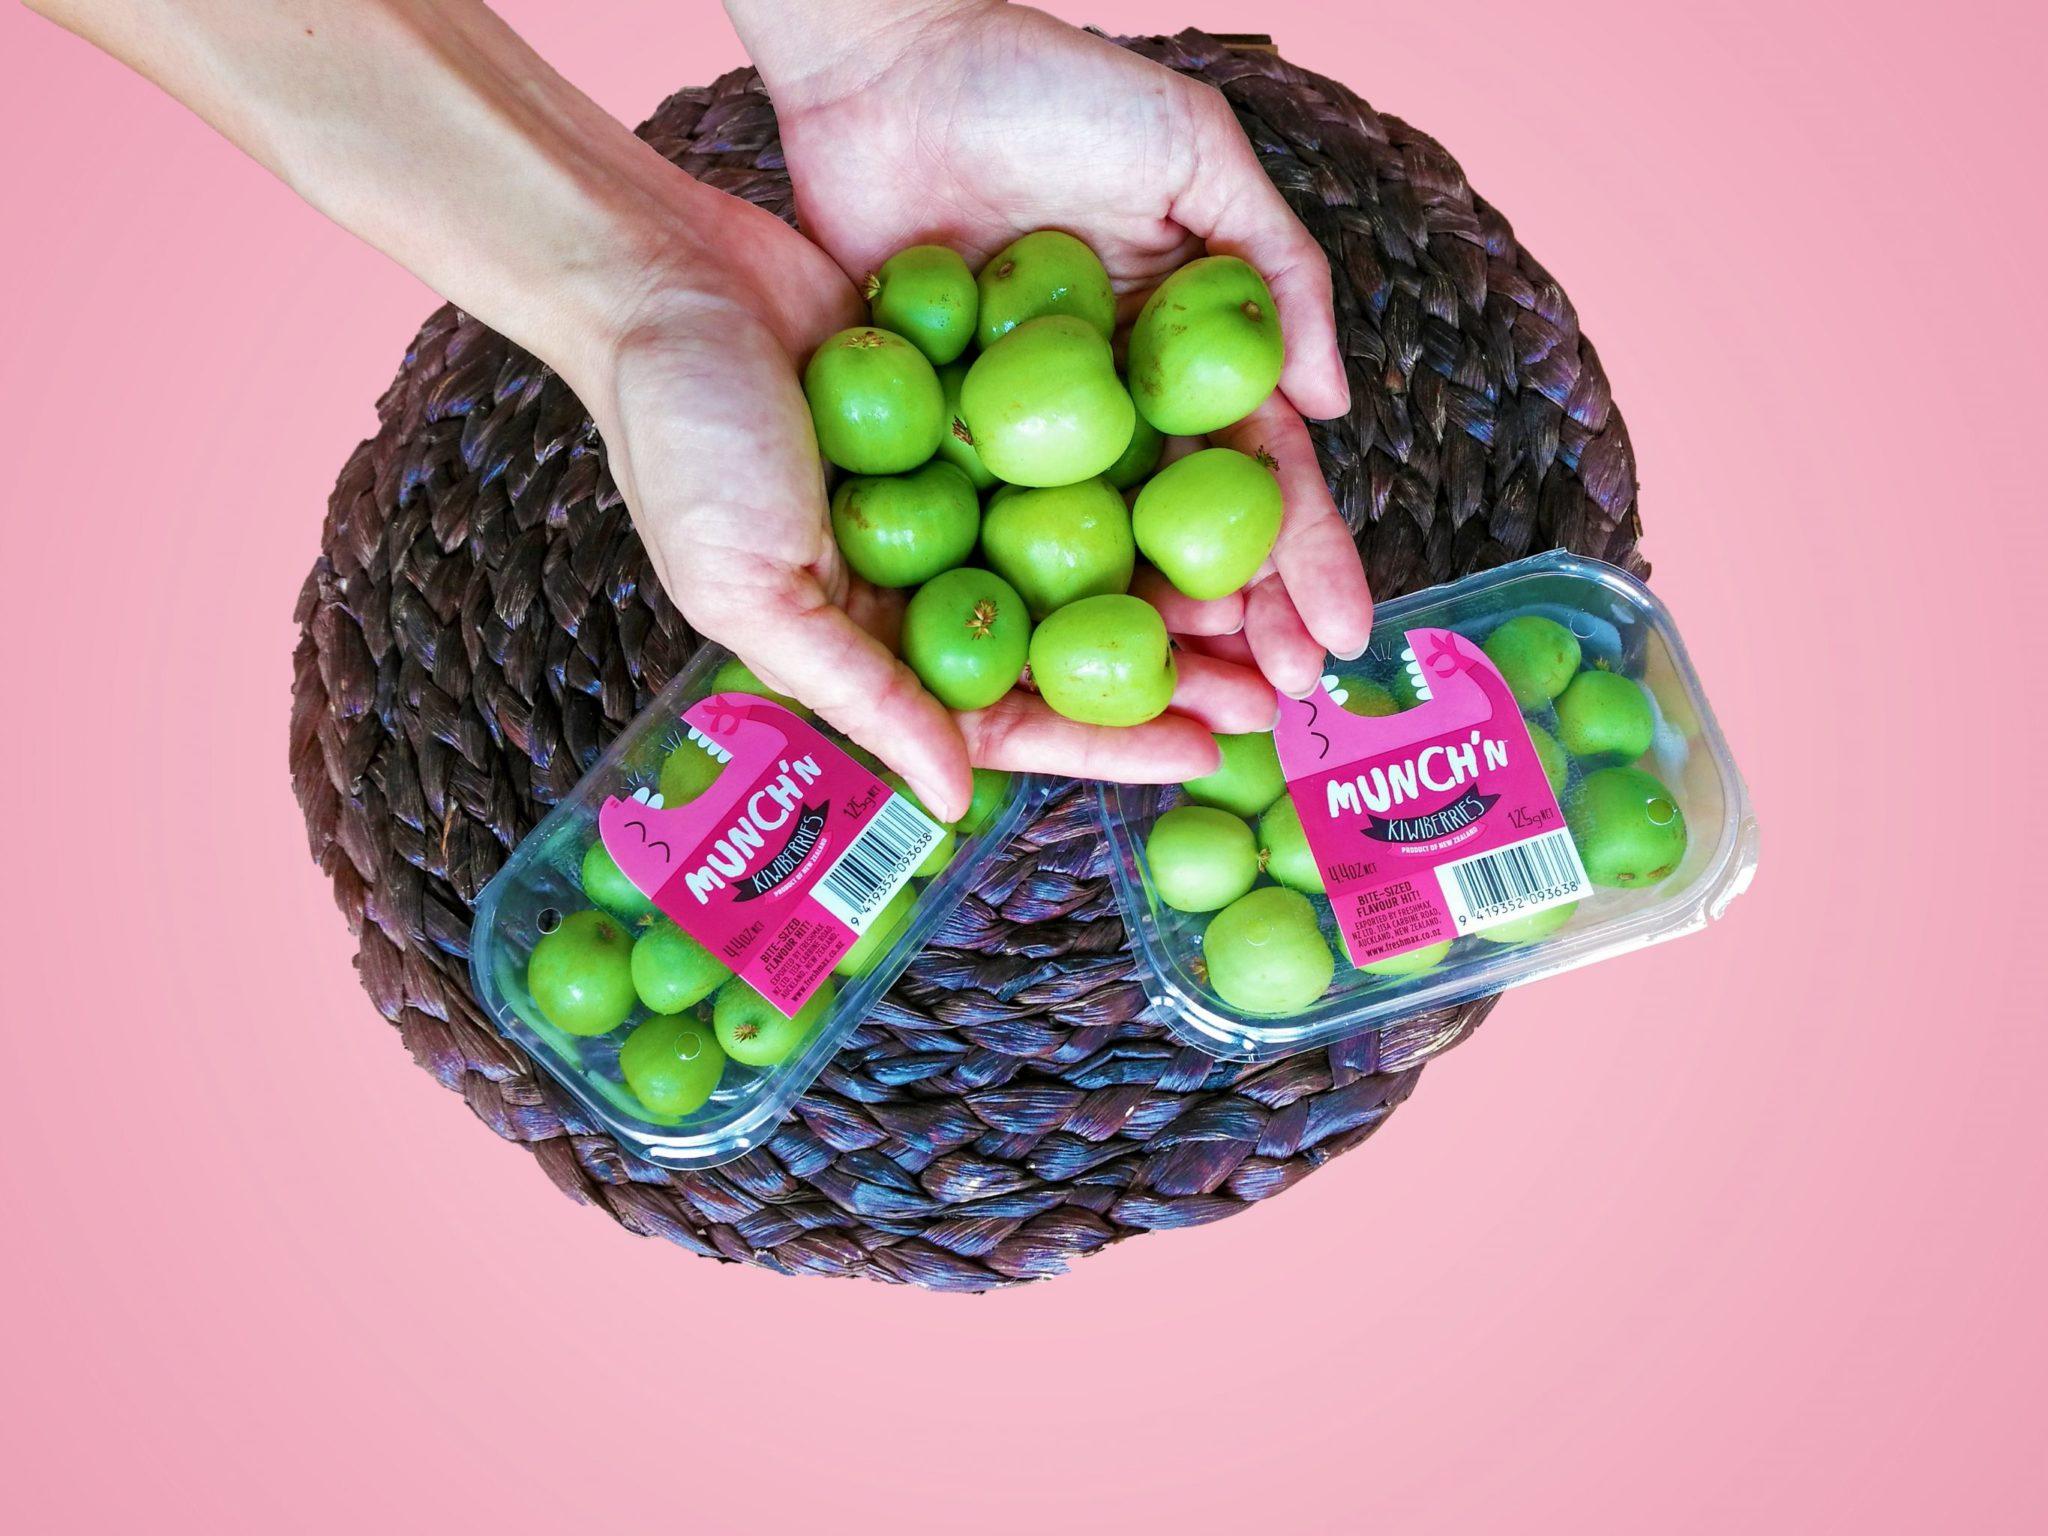 Munch'n kiwiberries - ซูเปอร์ฟรุตขนาดจิ๋วสุดคิ้วท์พันธุ์ใหม่มาถึงเมืองไทยแล้ว! 2 -